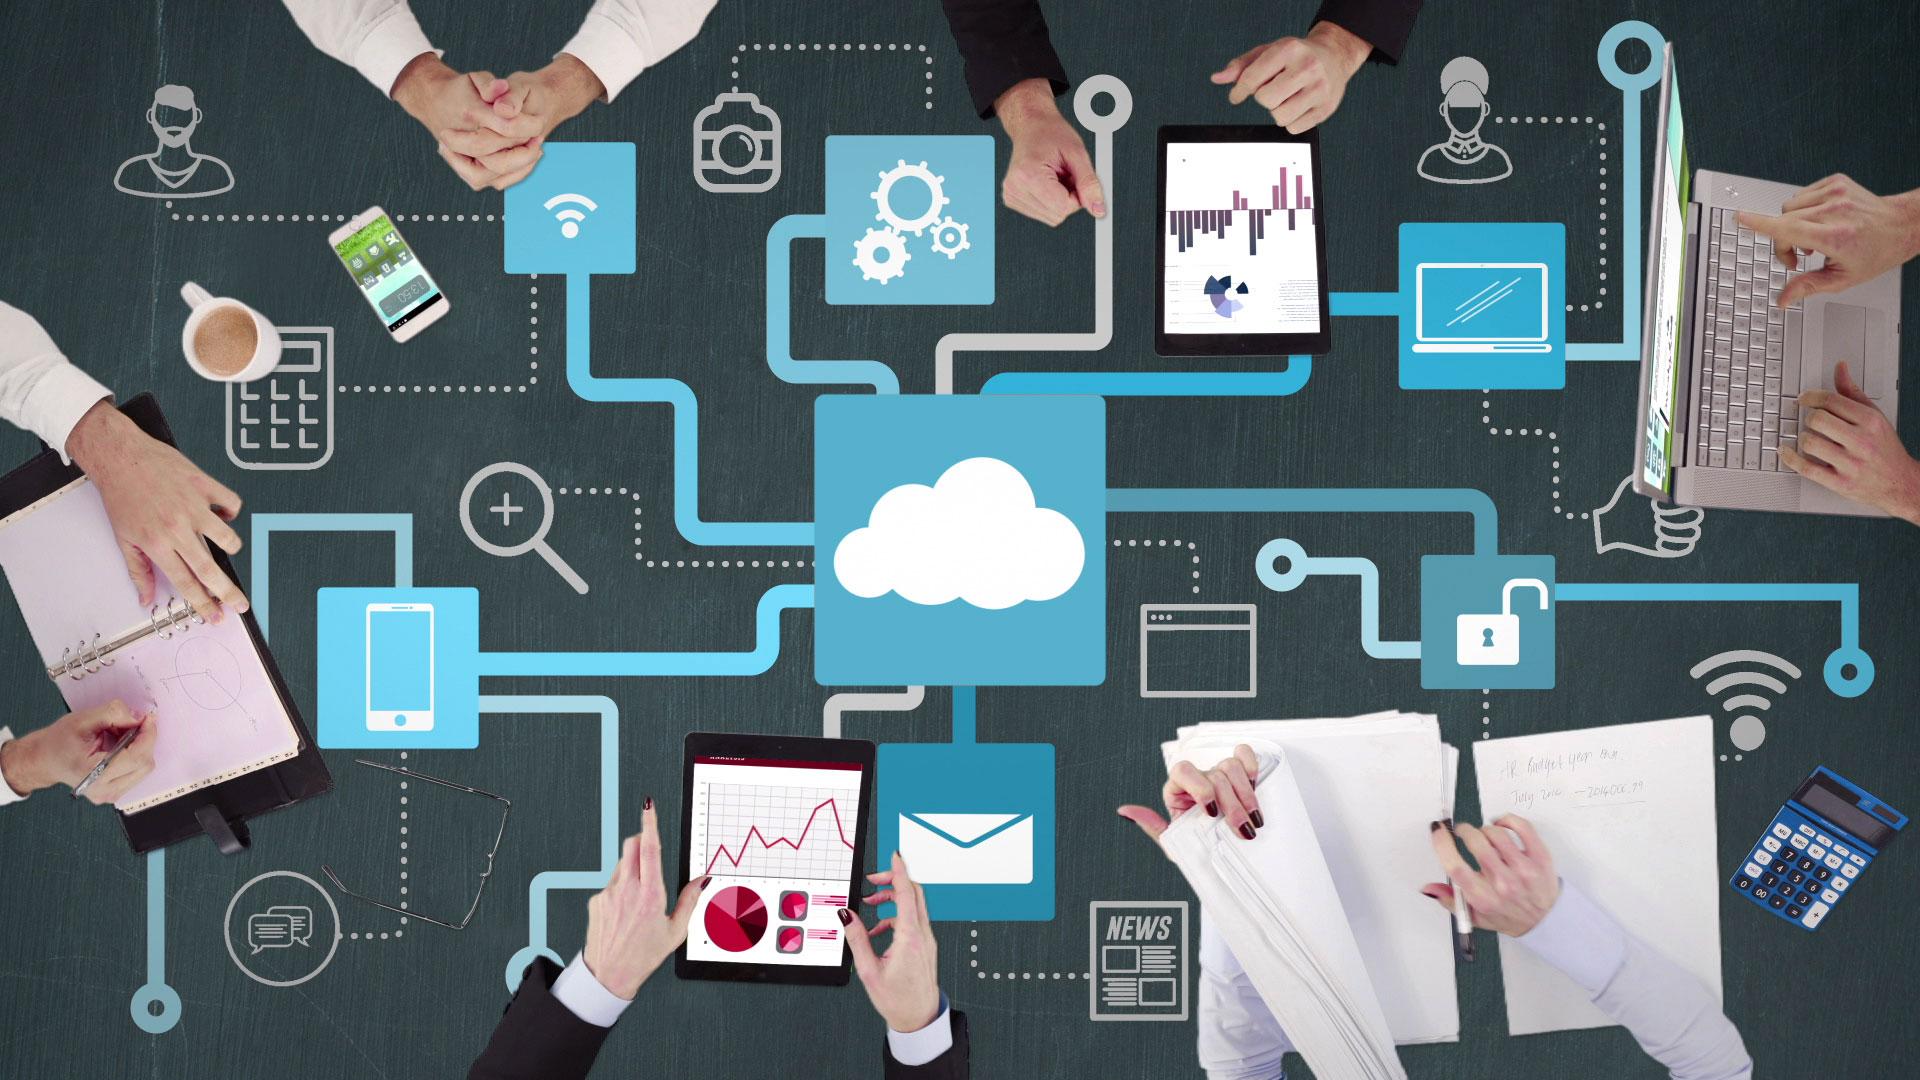 שירותי ענן | פתרונות ענן